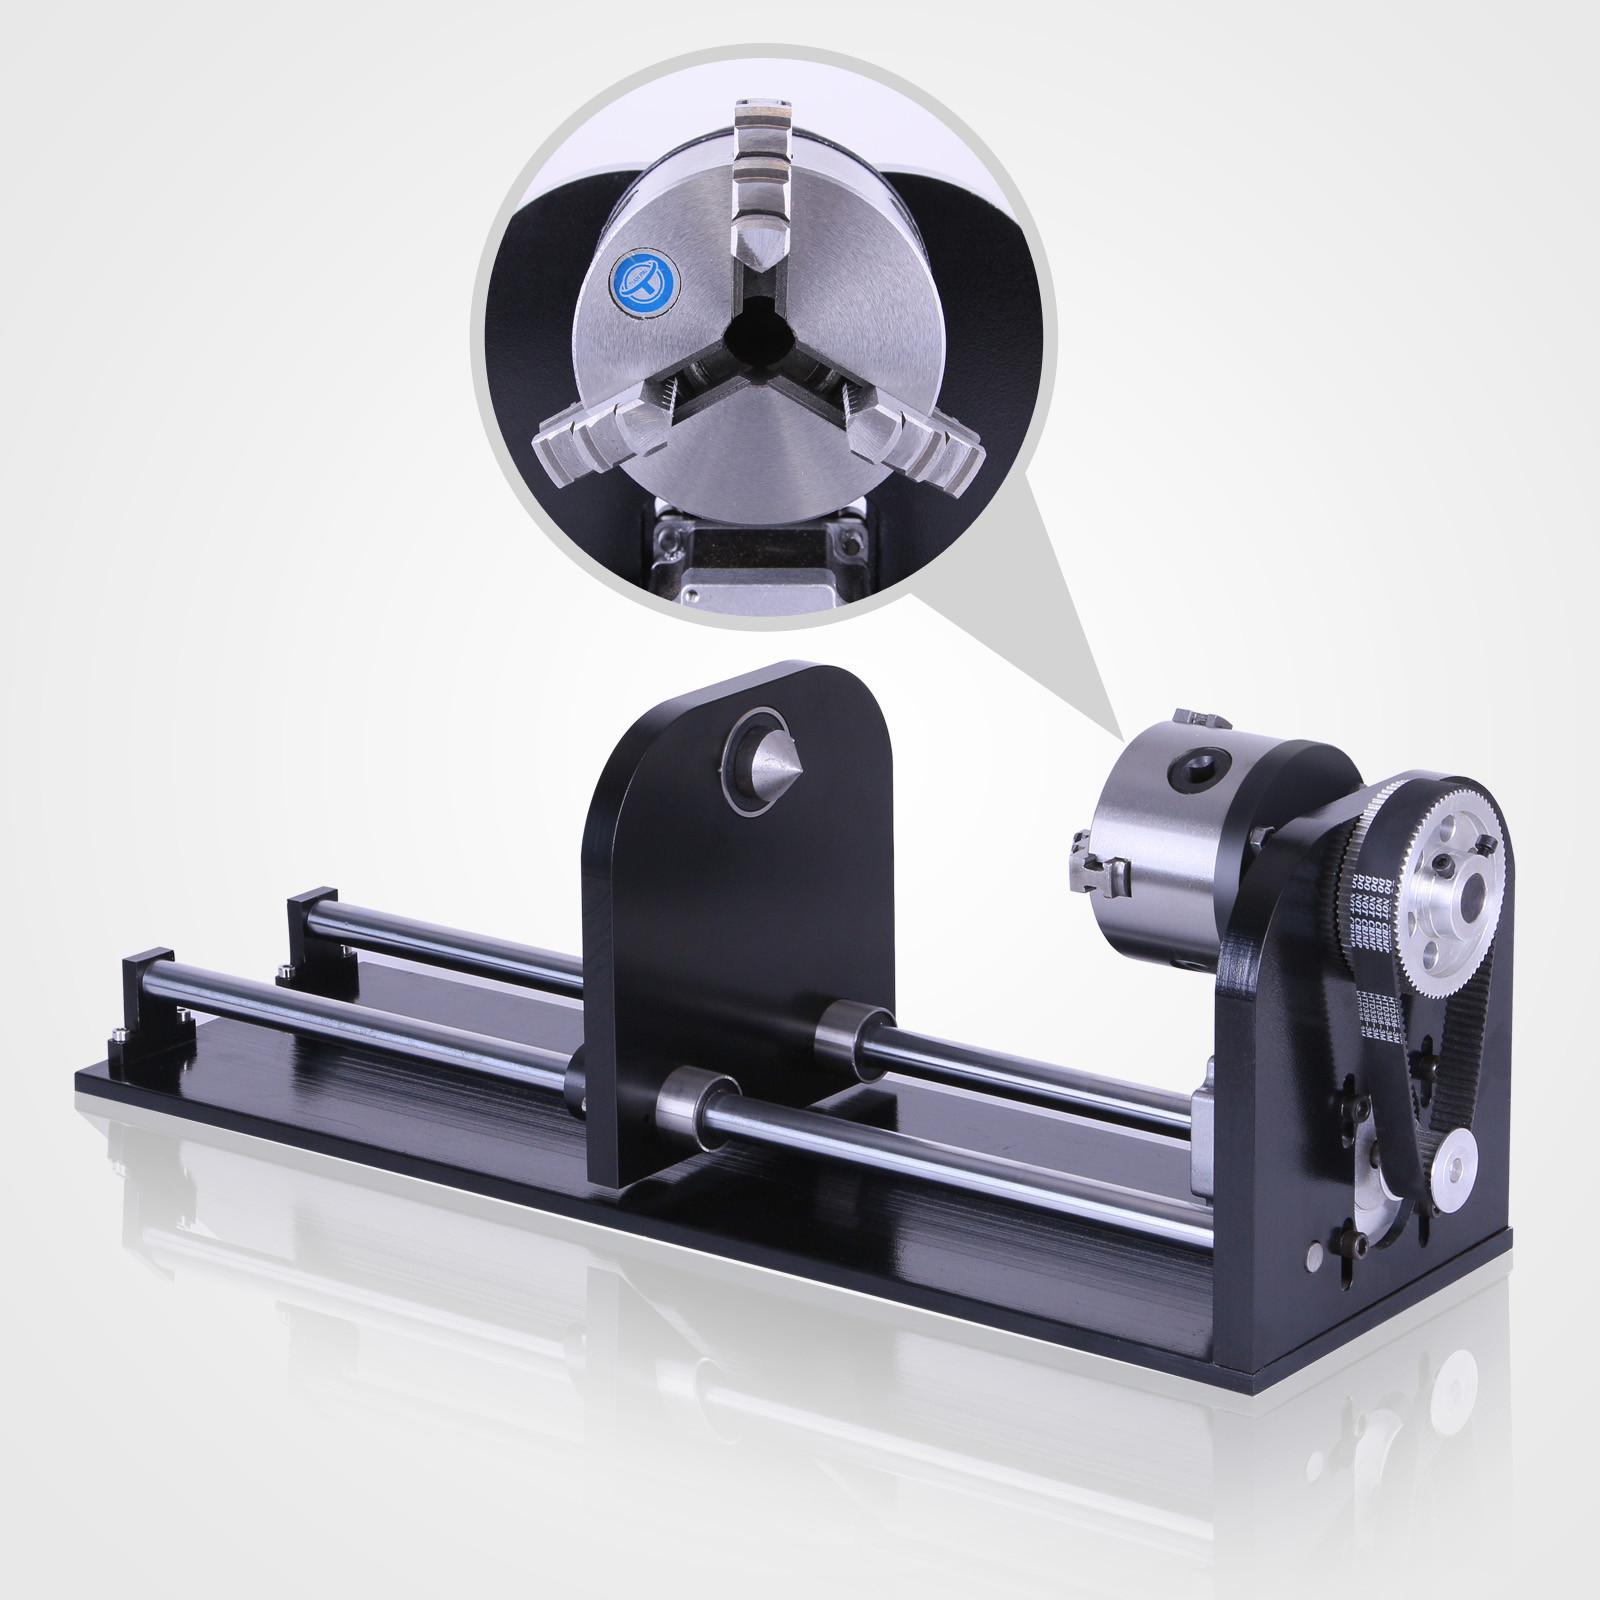 Co2 Laser Engraving Machine U Flash Usb Port Cnc A Axis Rotary Ebay Fan Control Harbor Breeze 600 Watt Black 3 Speed Ceiling